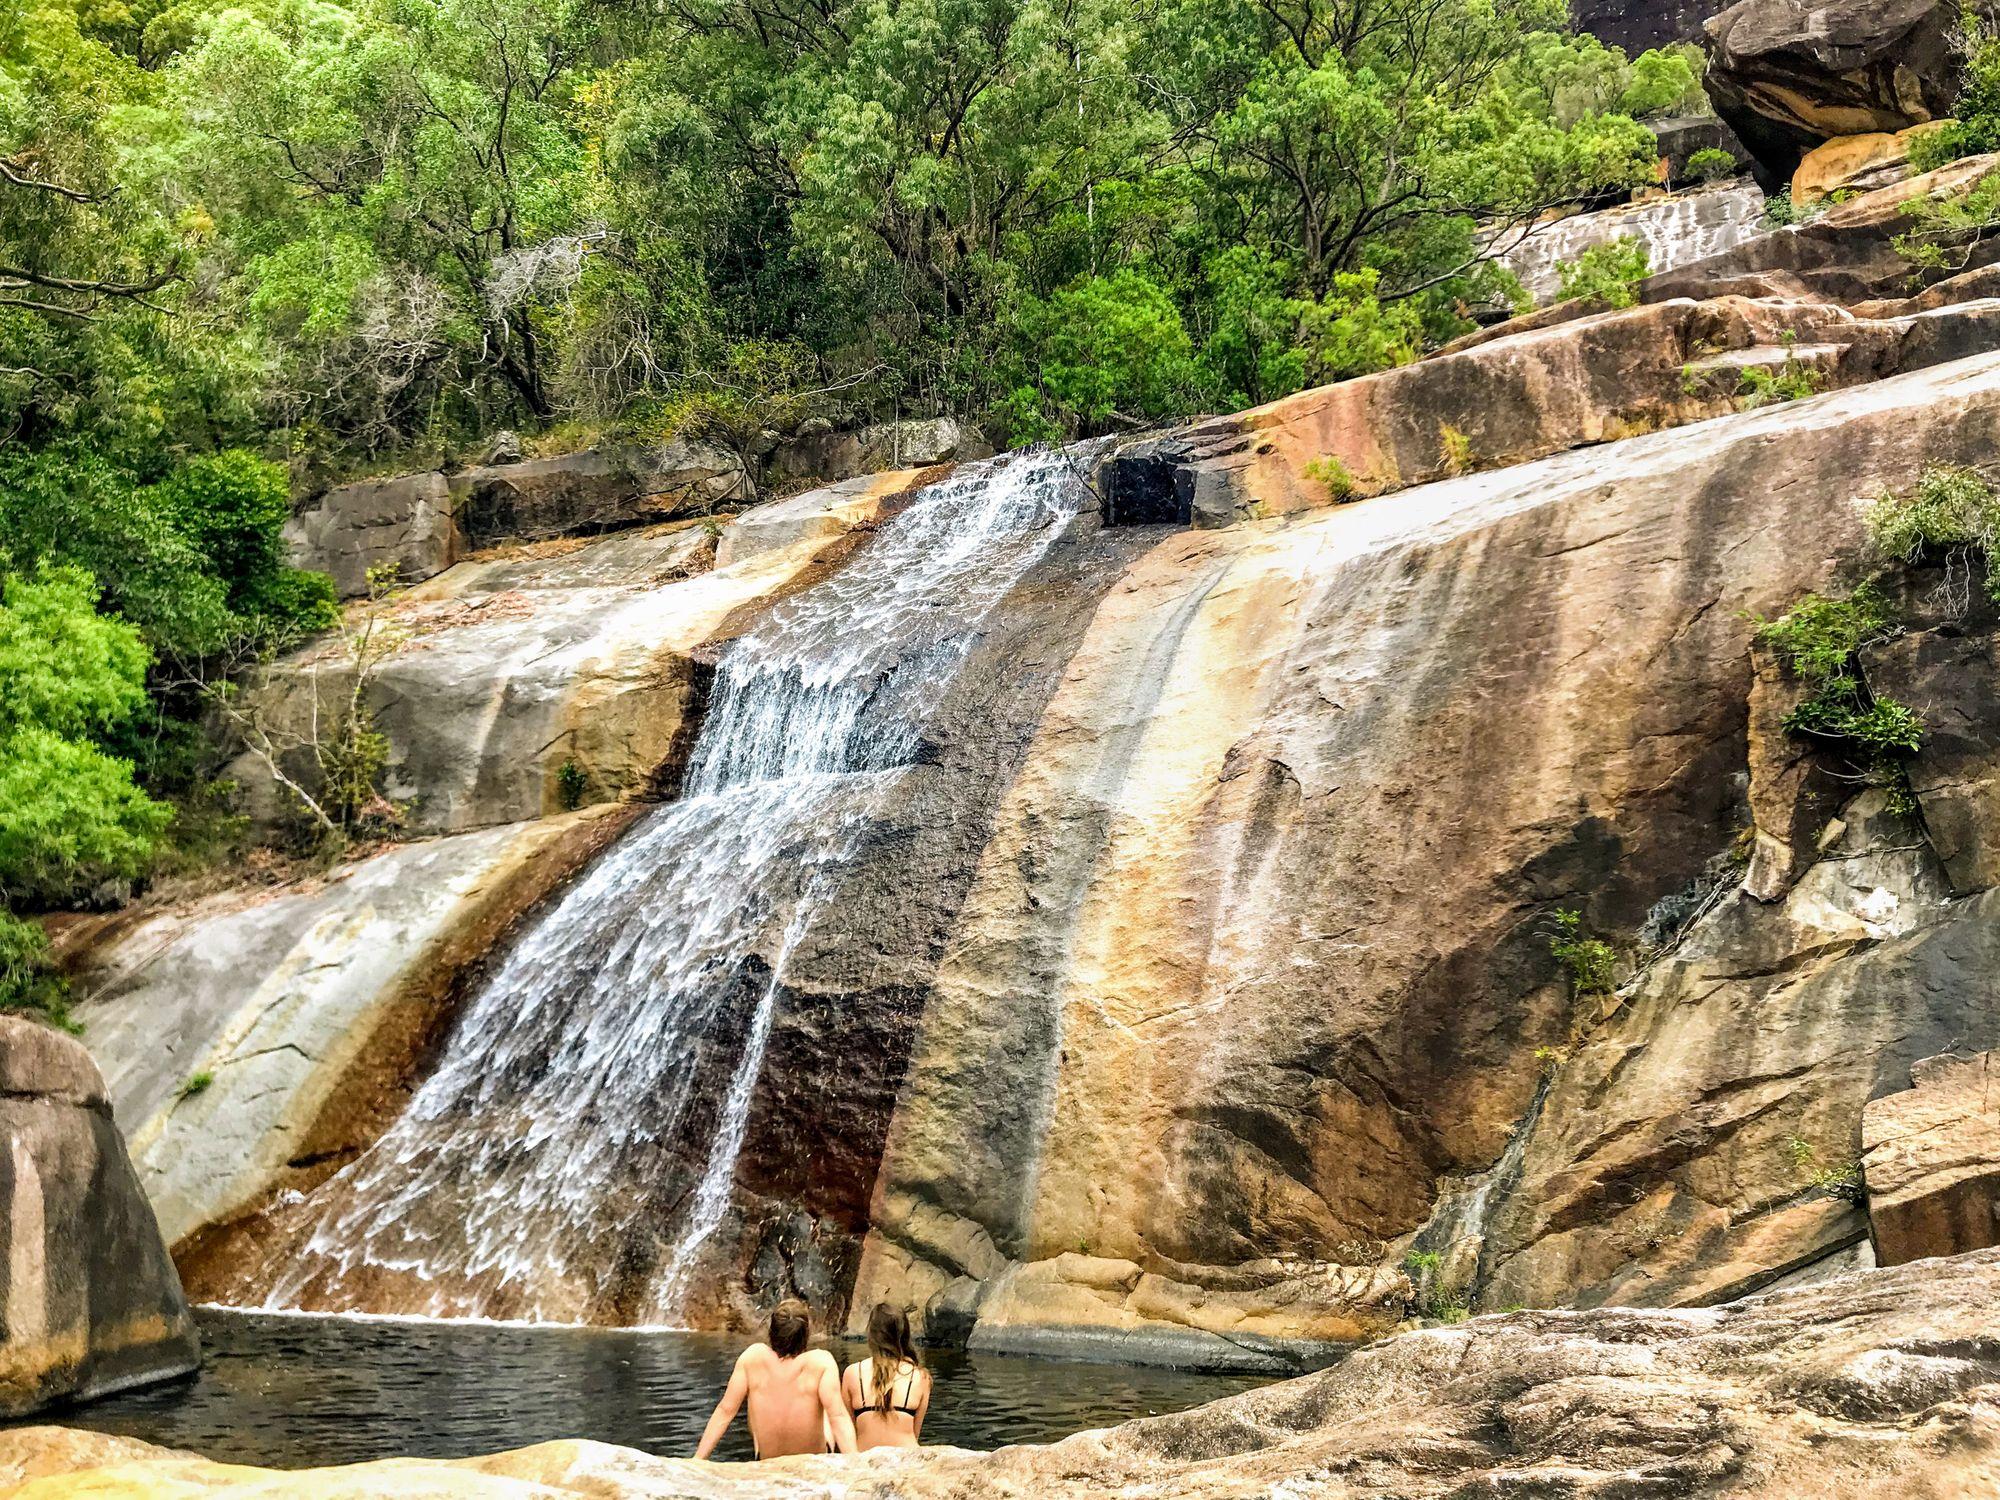 alligator creek falls swimming sean sullivan shannon tapper